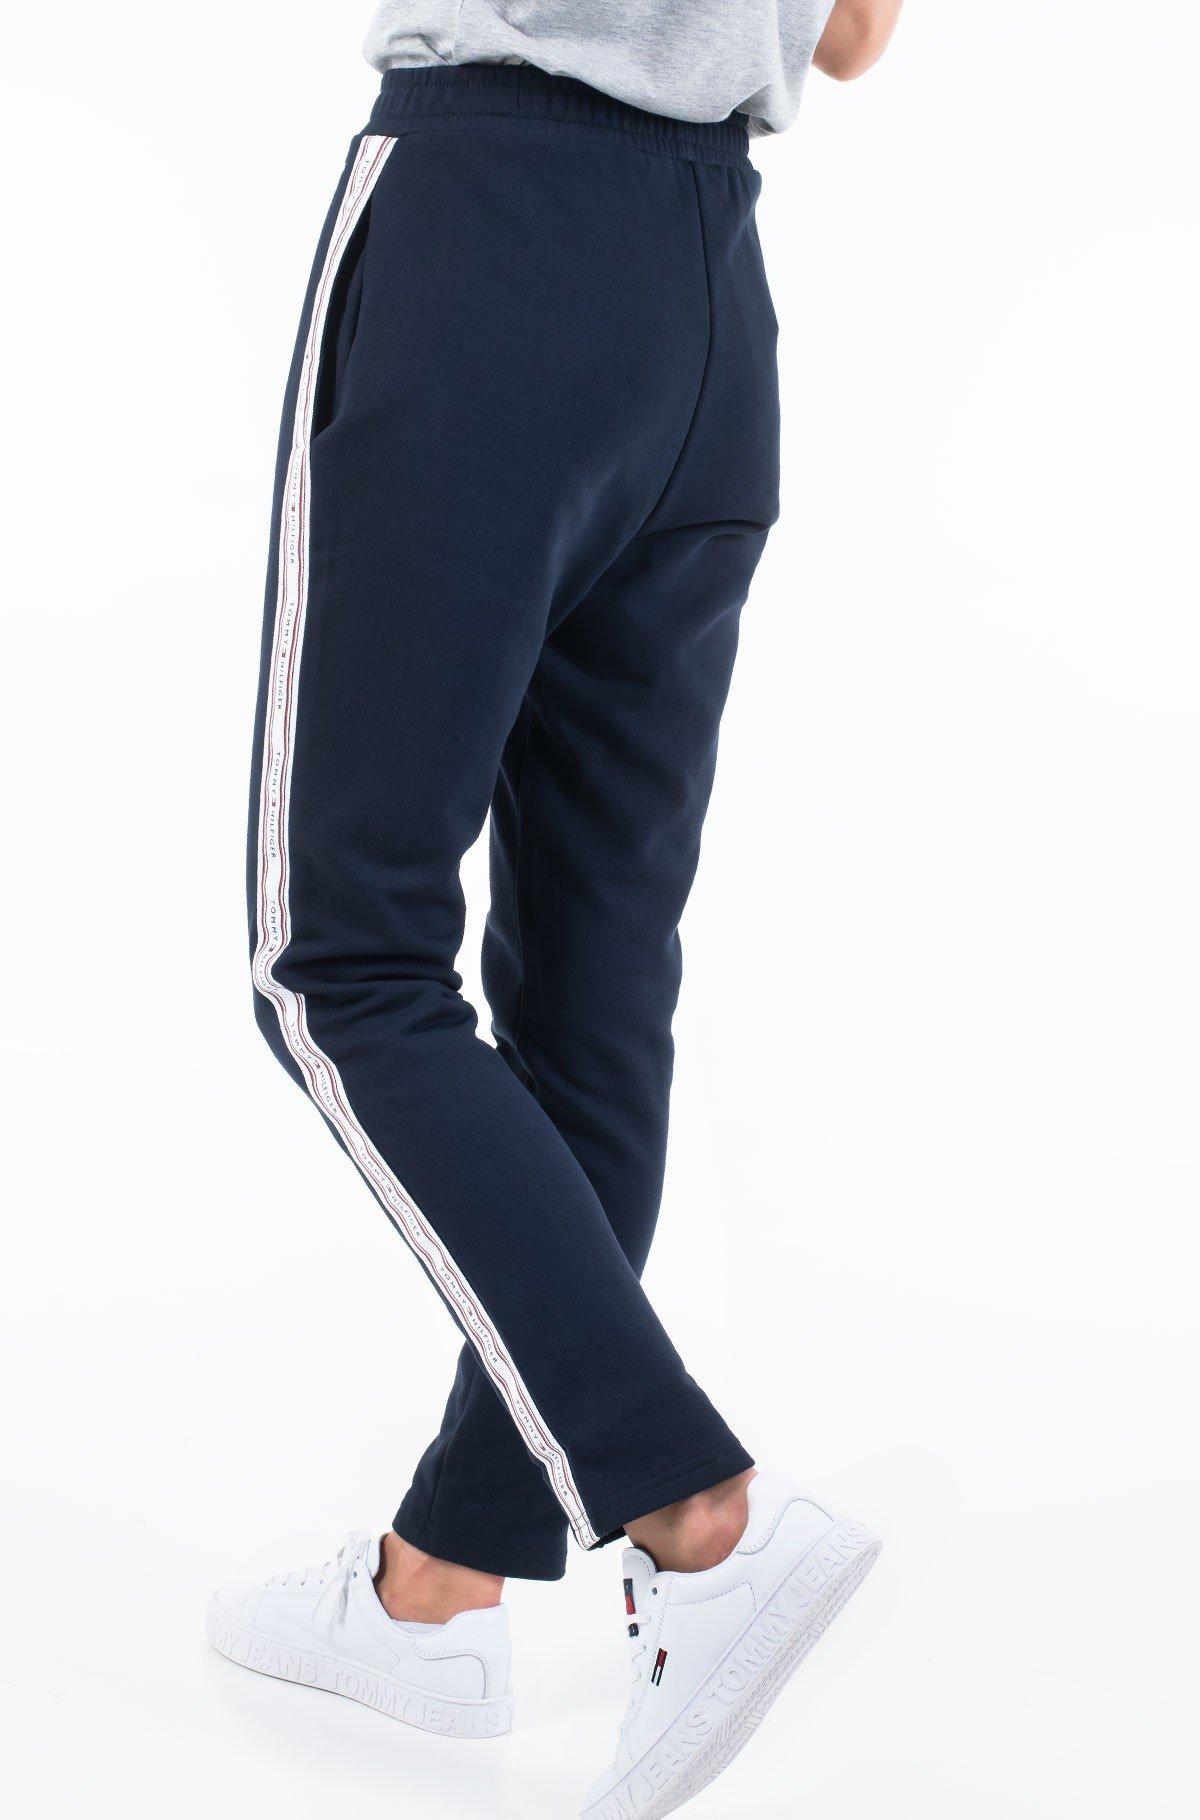 Sportinės kelnės RAVEN PANT-full-2